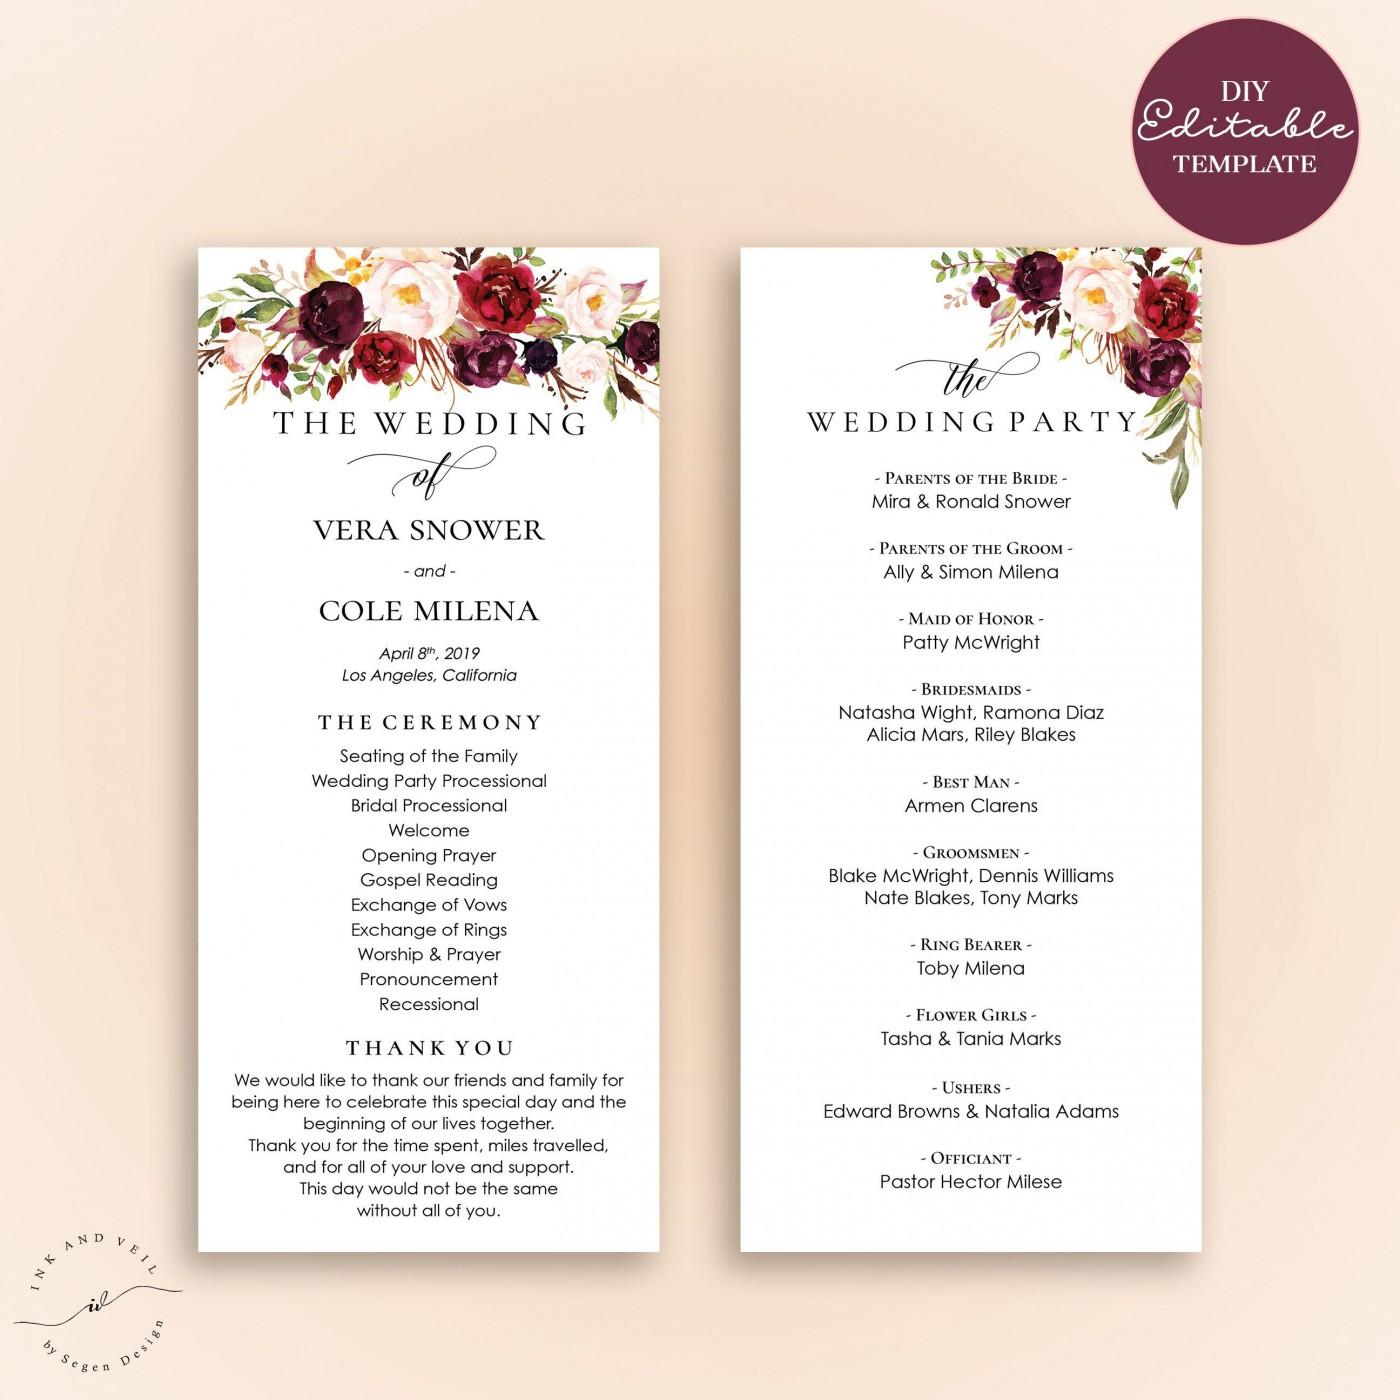 003 Stirring Free Template For Wedding Ceremony Program Design 1400